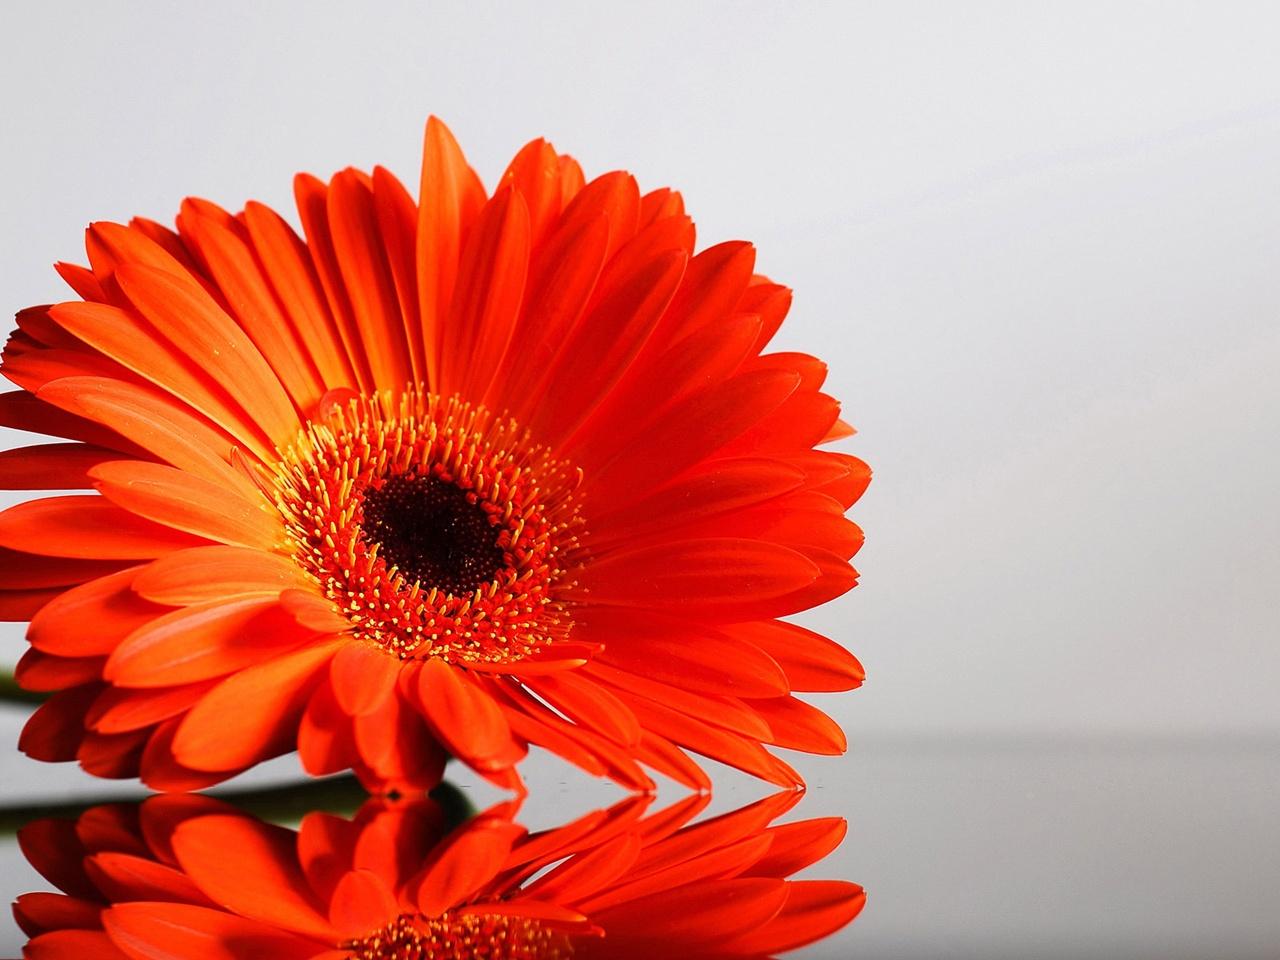 Orange Flowers 19353 1280x960 px ~ HDWallSource.com